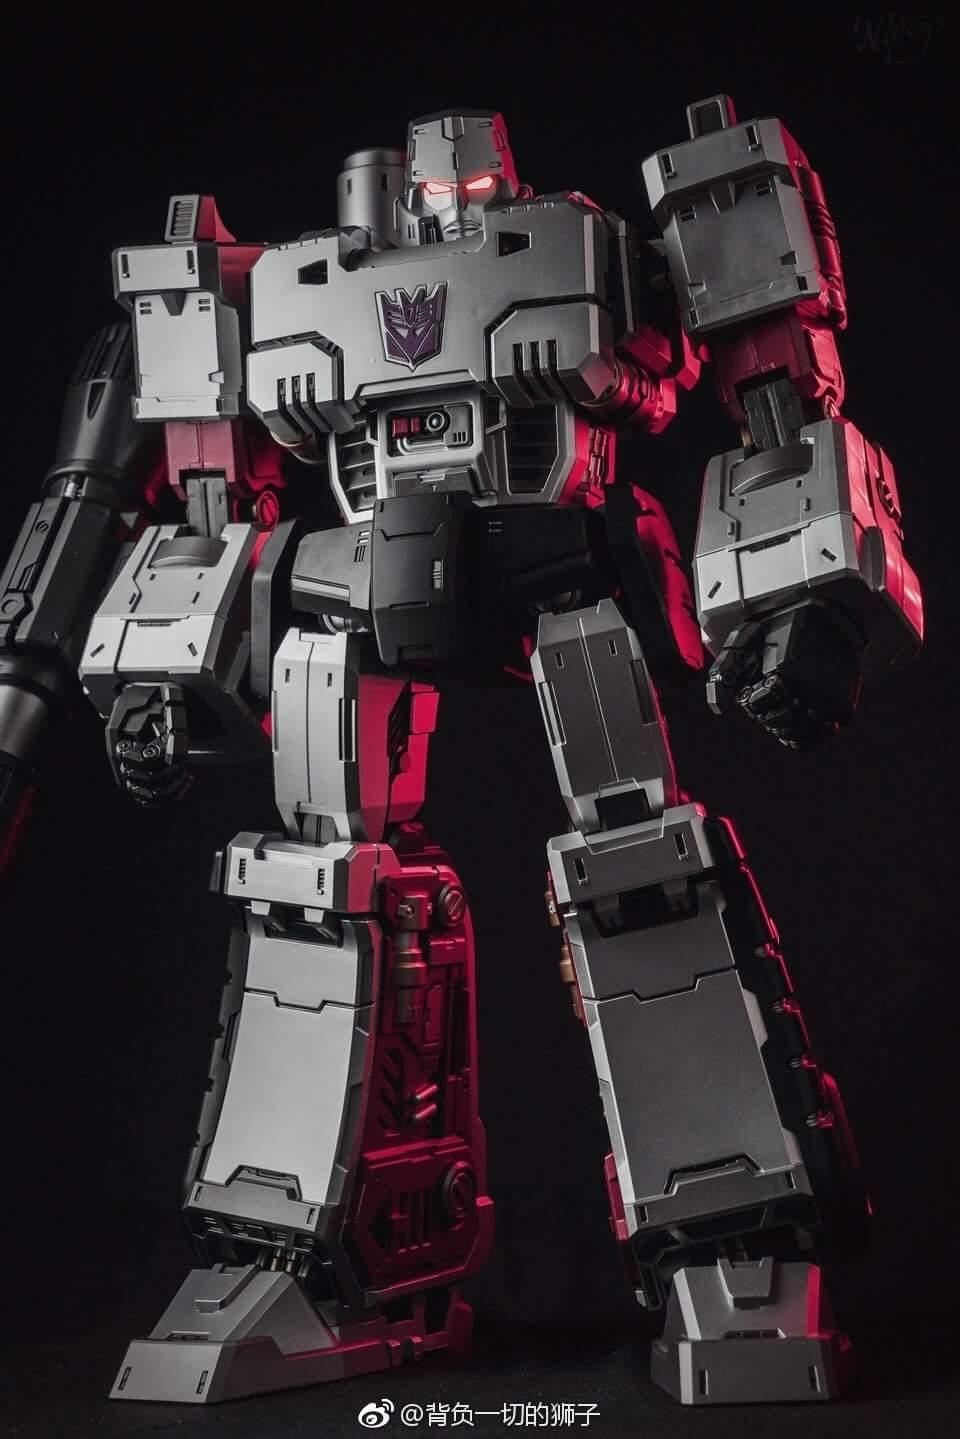 Figurines Transformers G1 (articulé, non transformable) ― Par 3A, Action Toys, Fewture, Toys Alliance, Sentinel, Kotobukiya, Kids Logic, Herocross, EX Gokin, etc - Page 6 SX9WOhyu_o